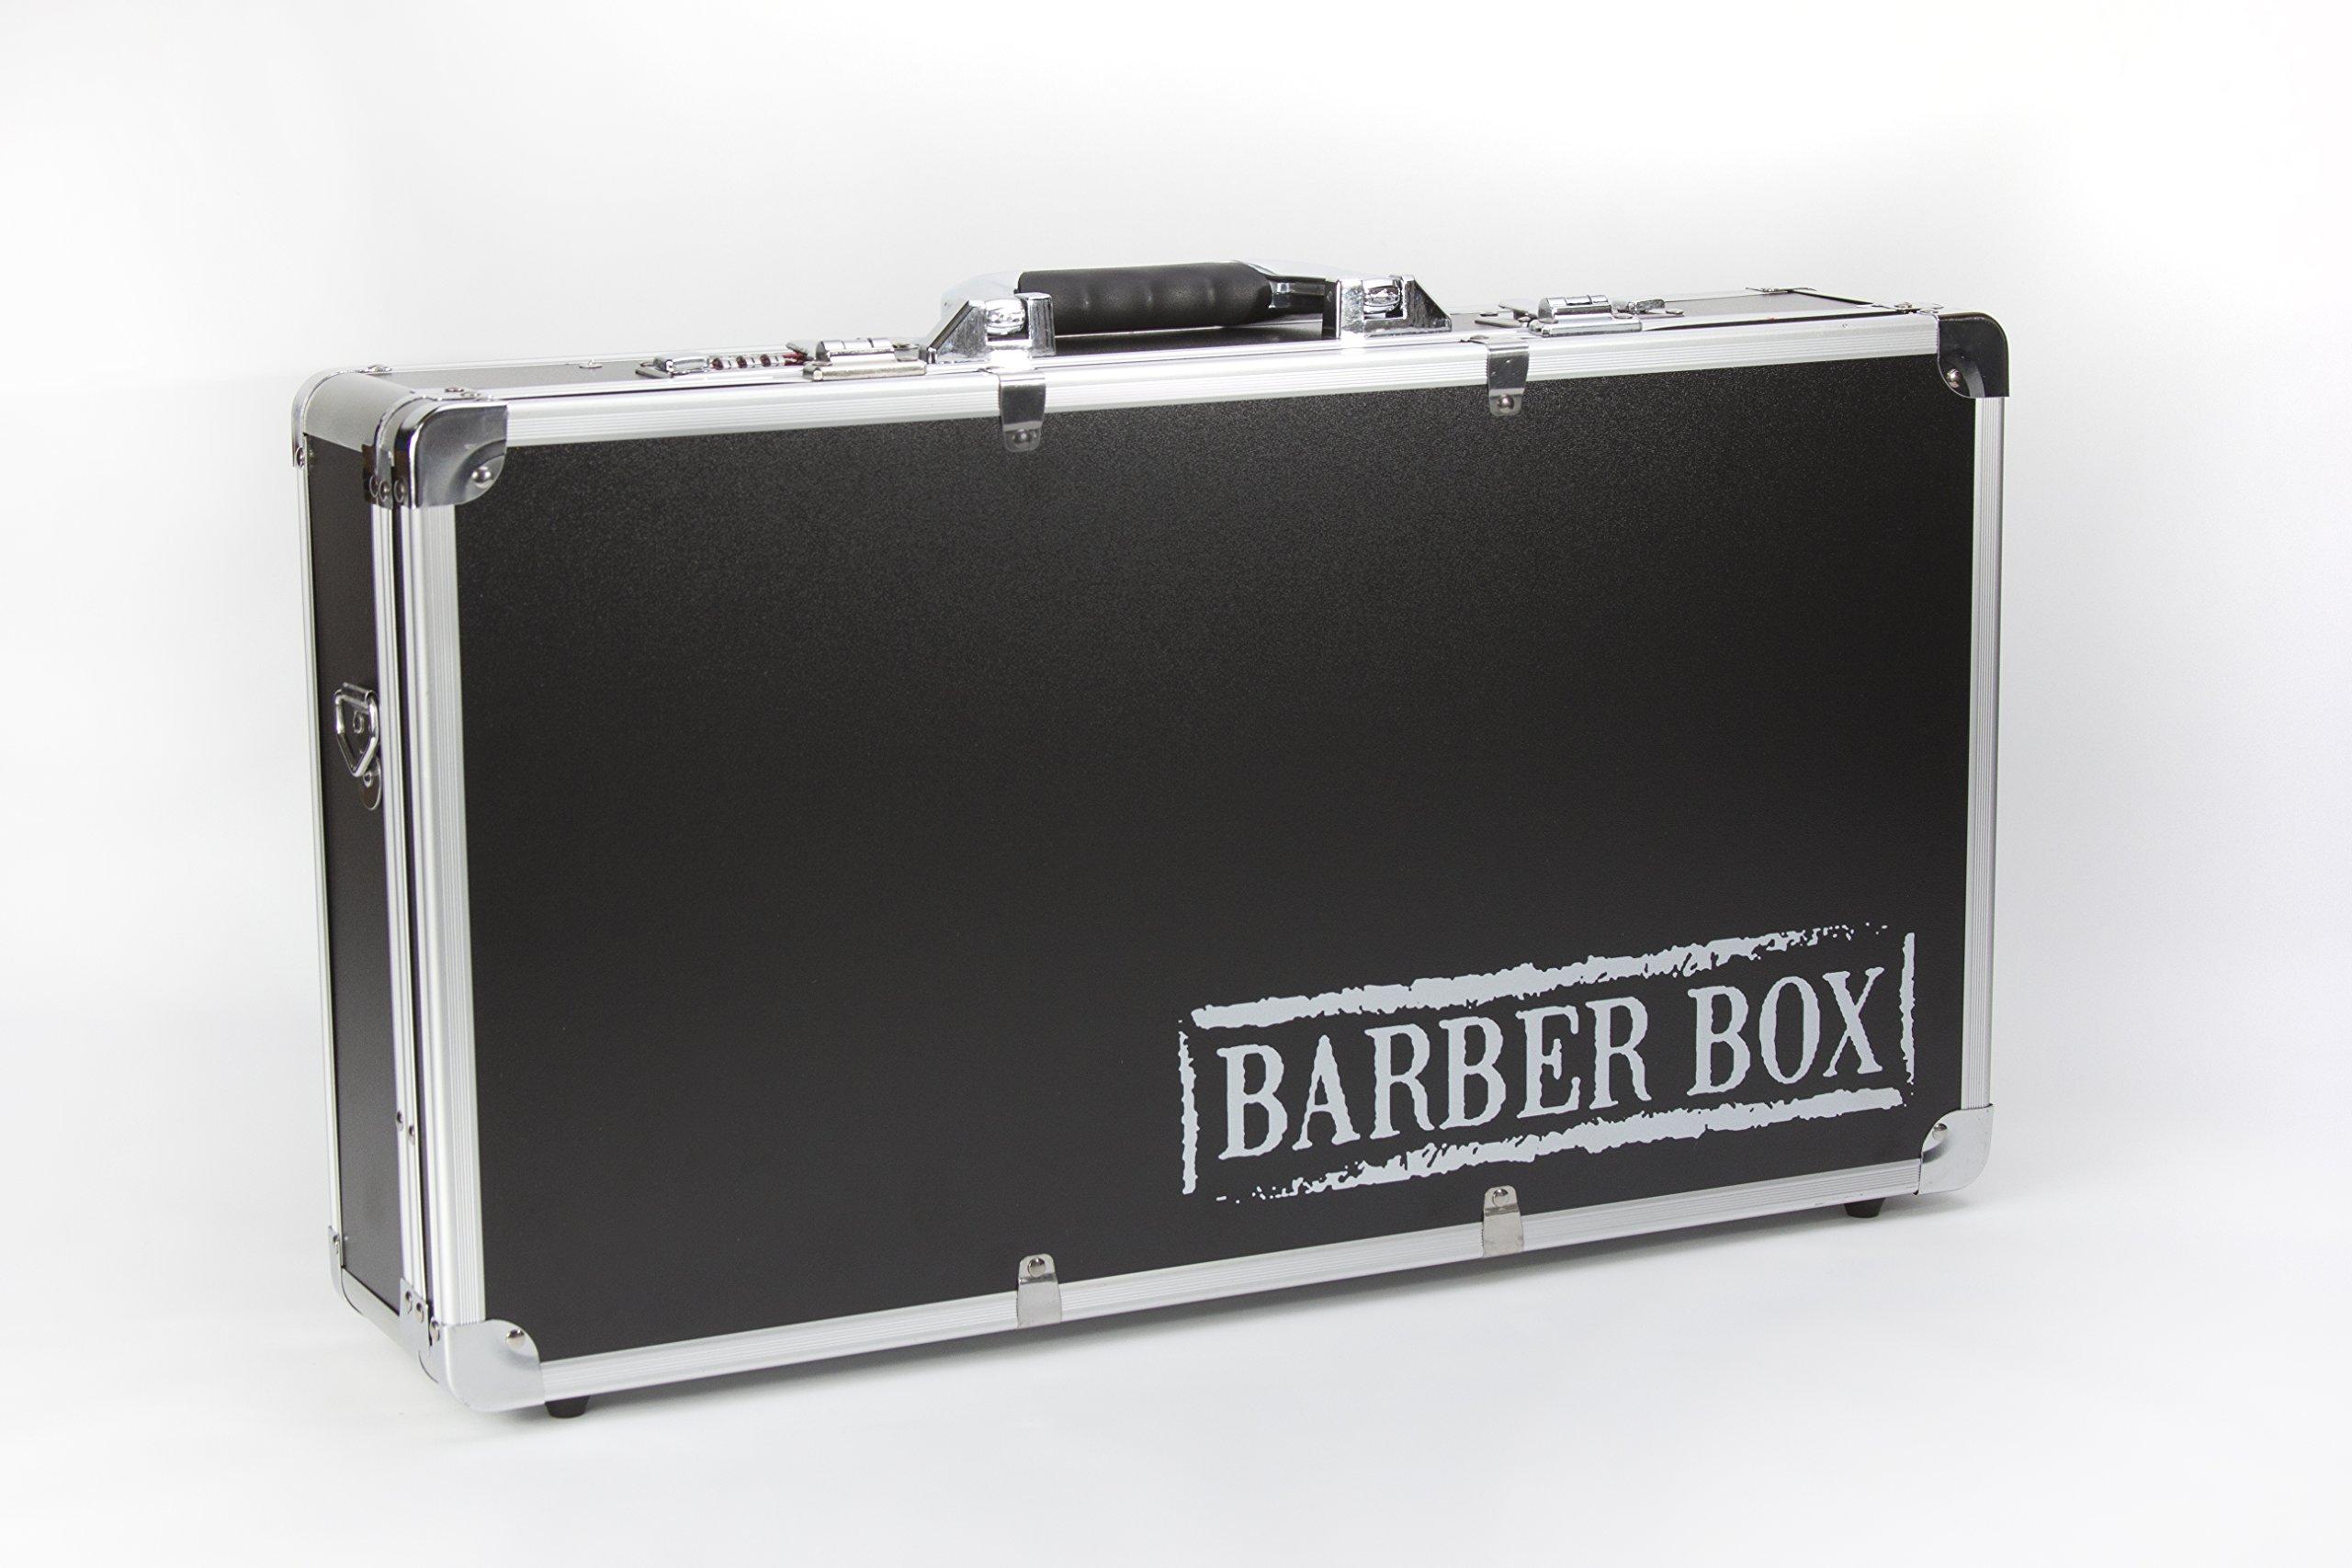 The Barber Box V5 by Barber Box